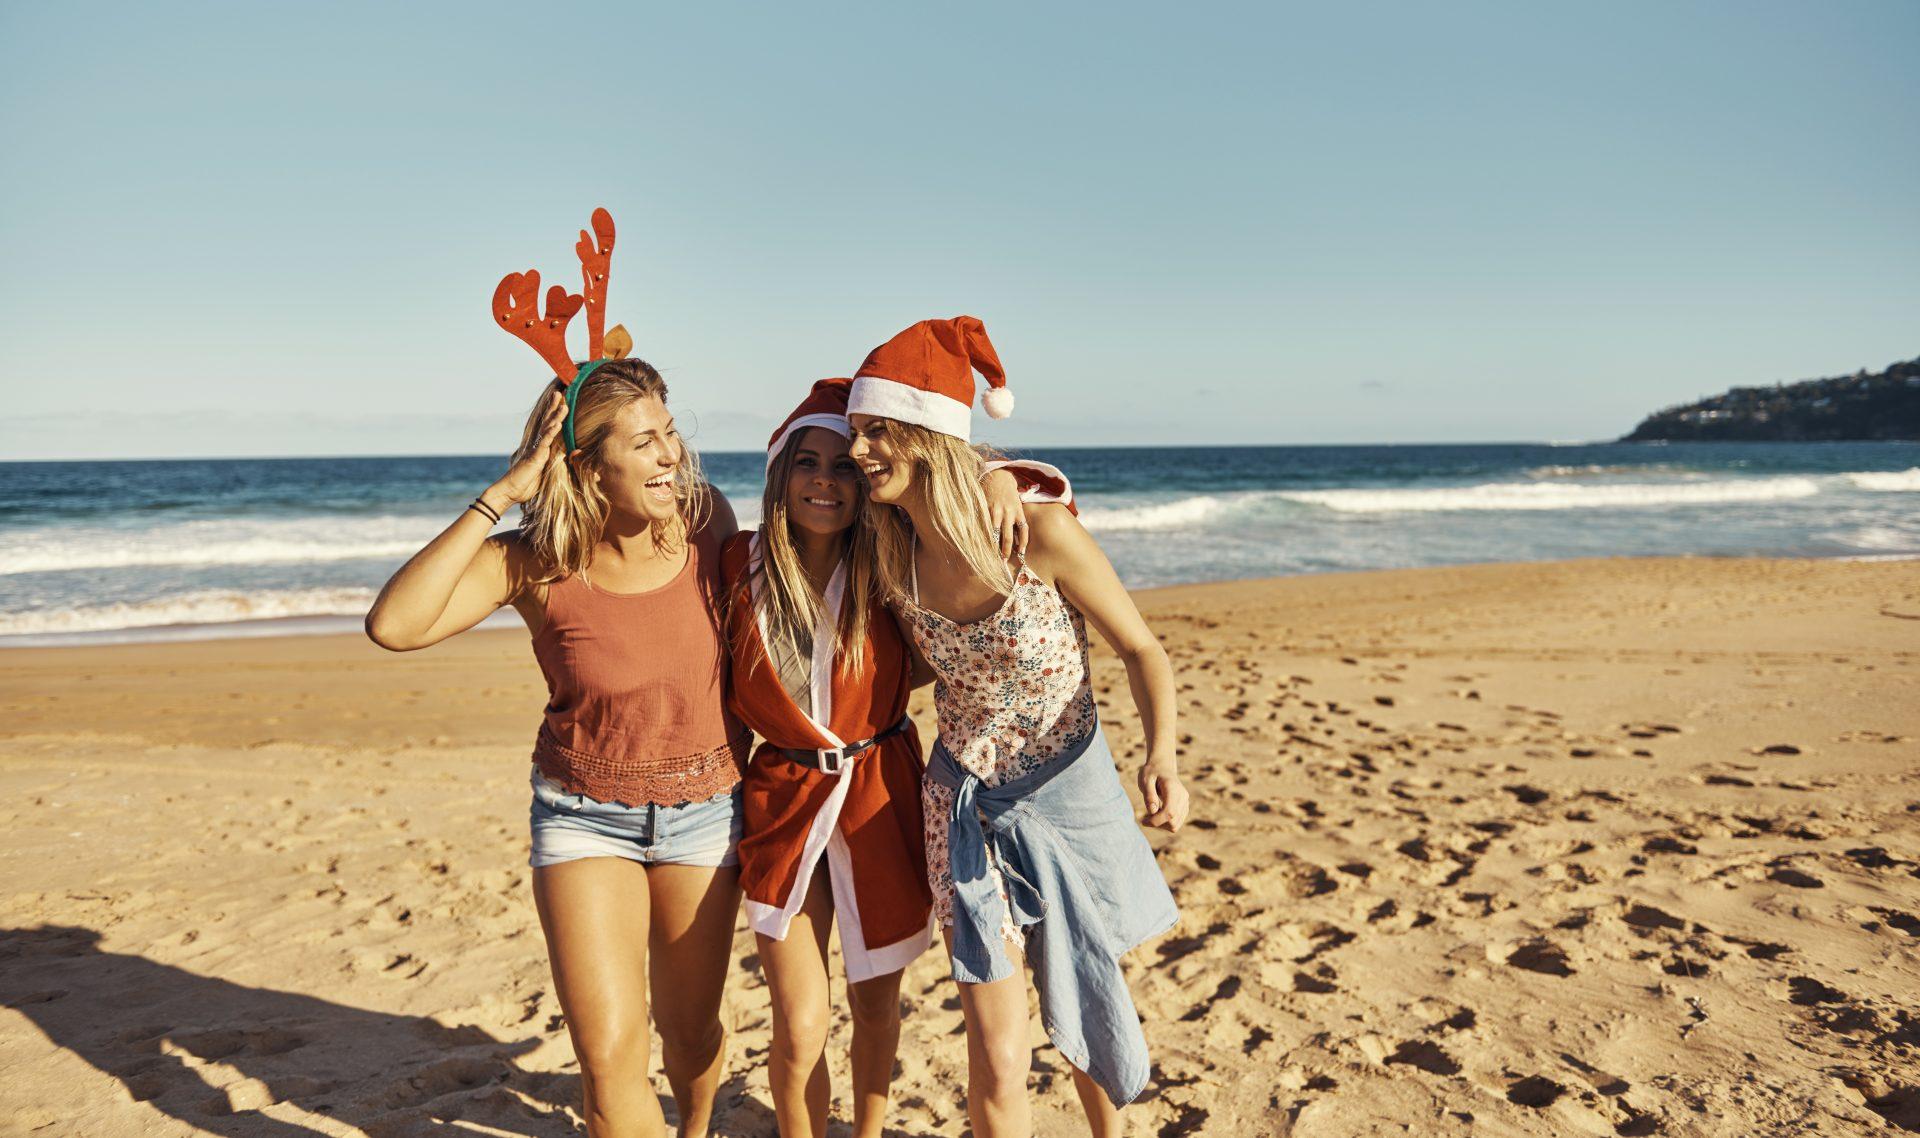 santa hats, beach